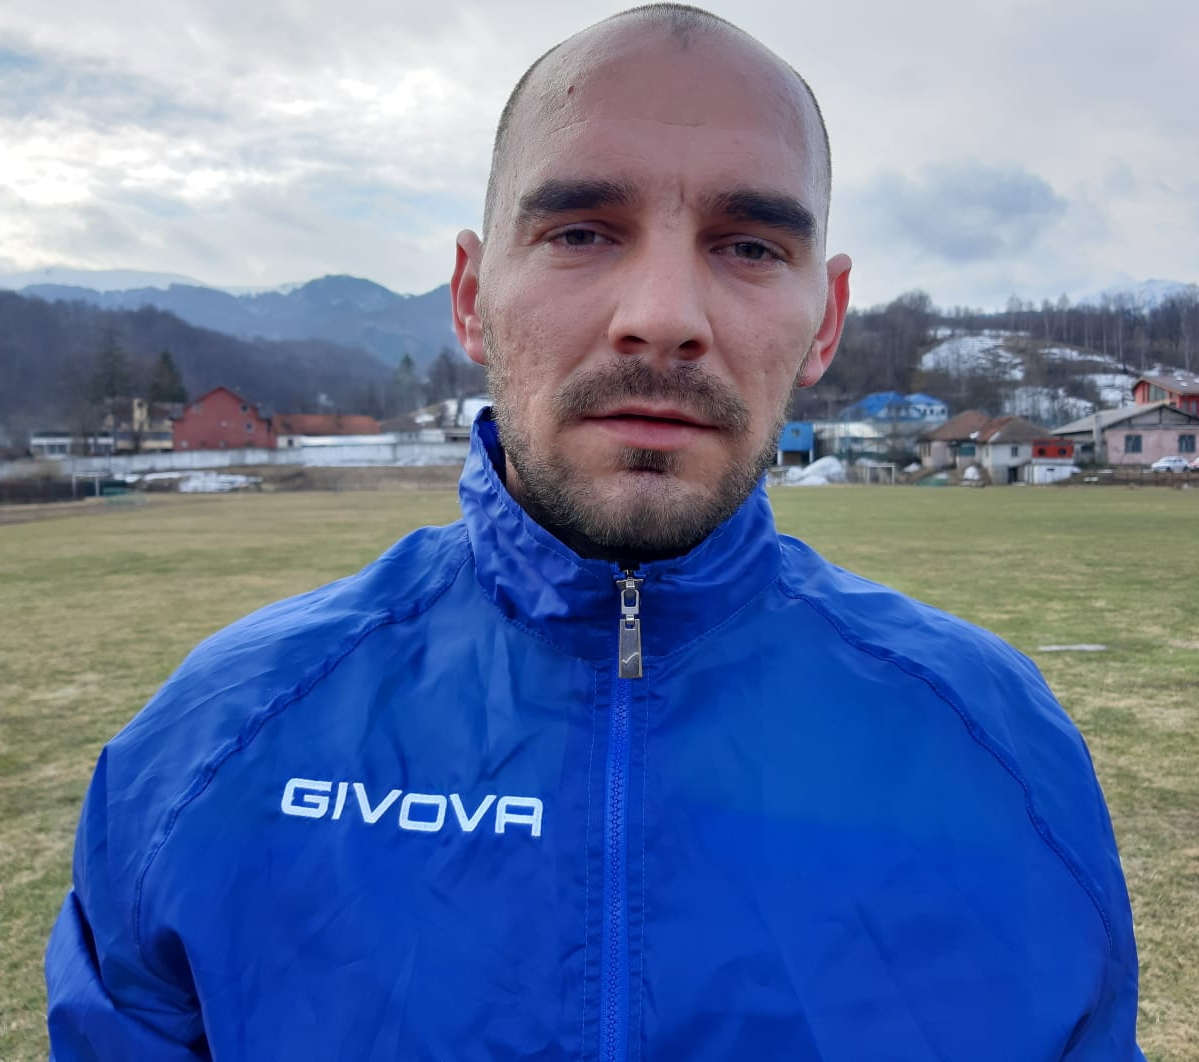 Oniciu Ioan Alexandru